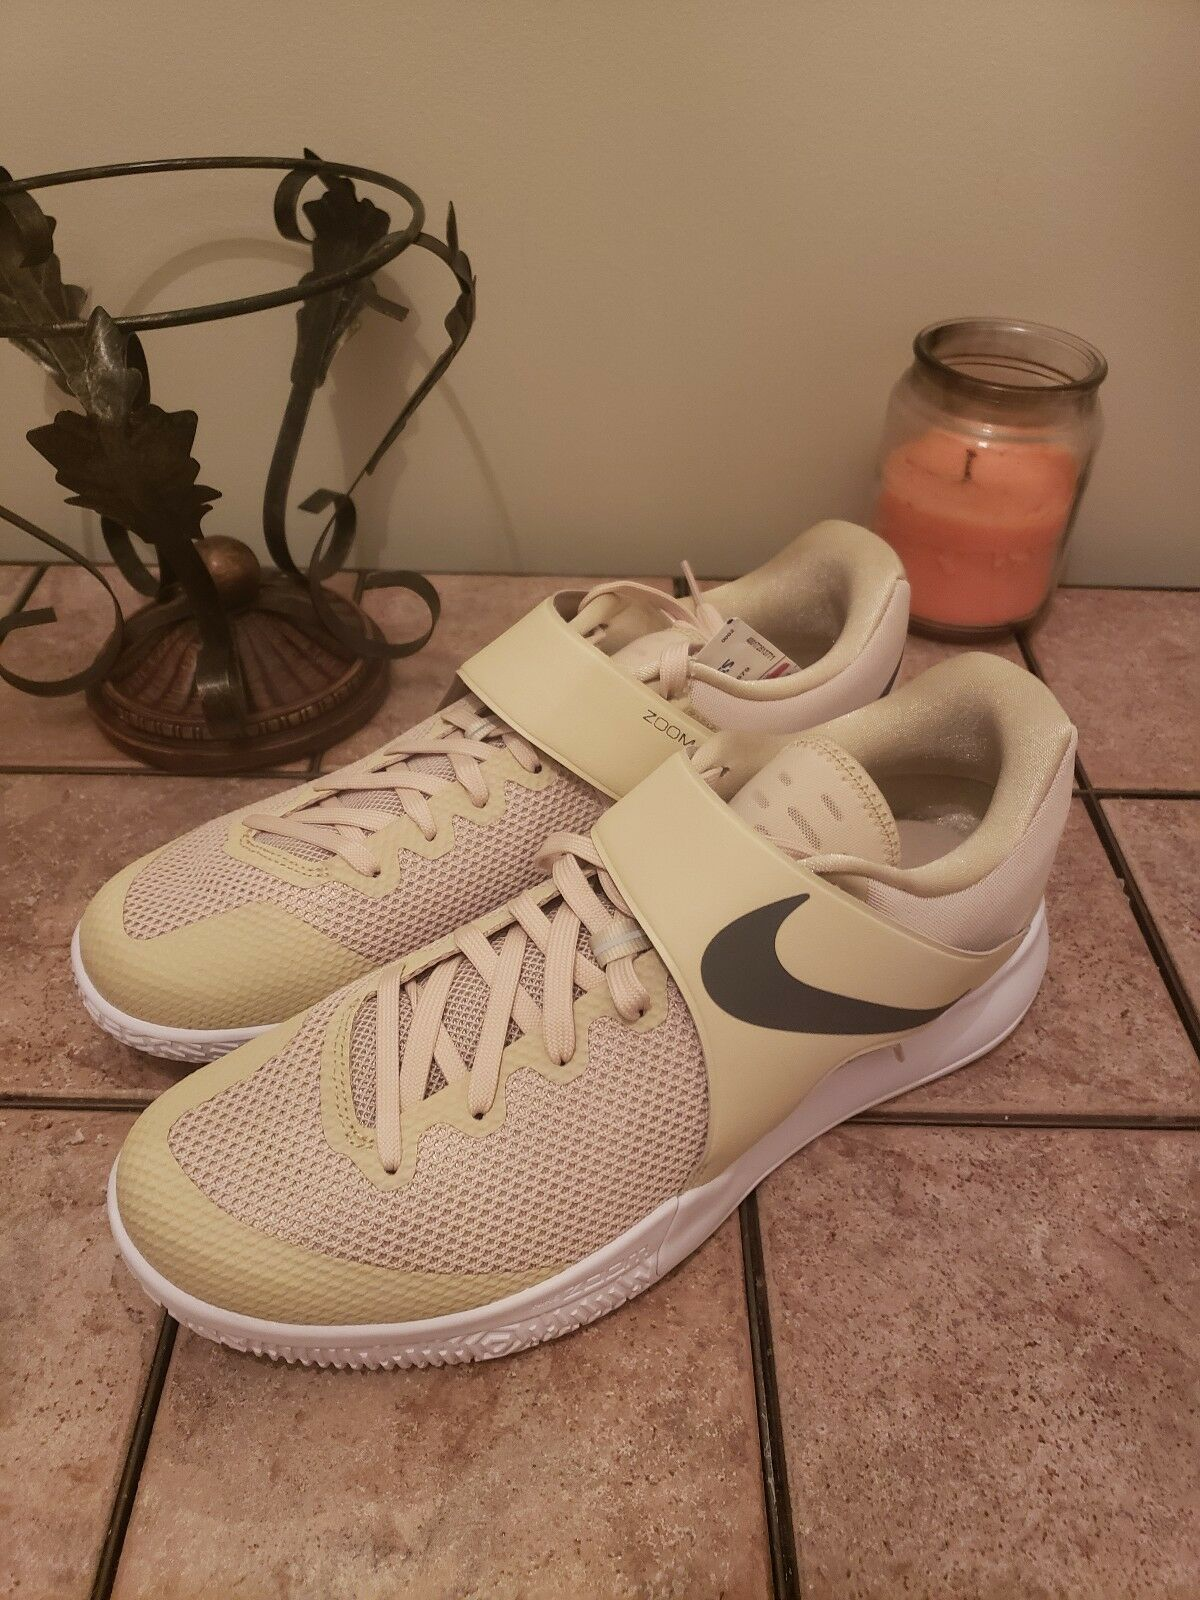 New Nike Zoom Live Men's B-Ball Sneakers. 902590-701  Beige  Sz.13 Ships free.